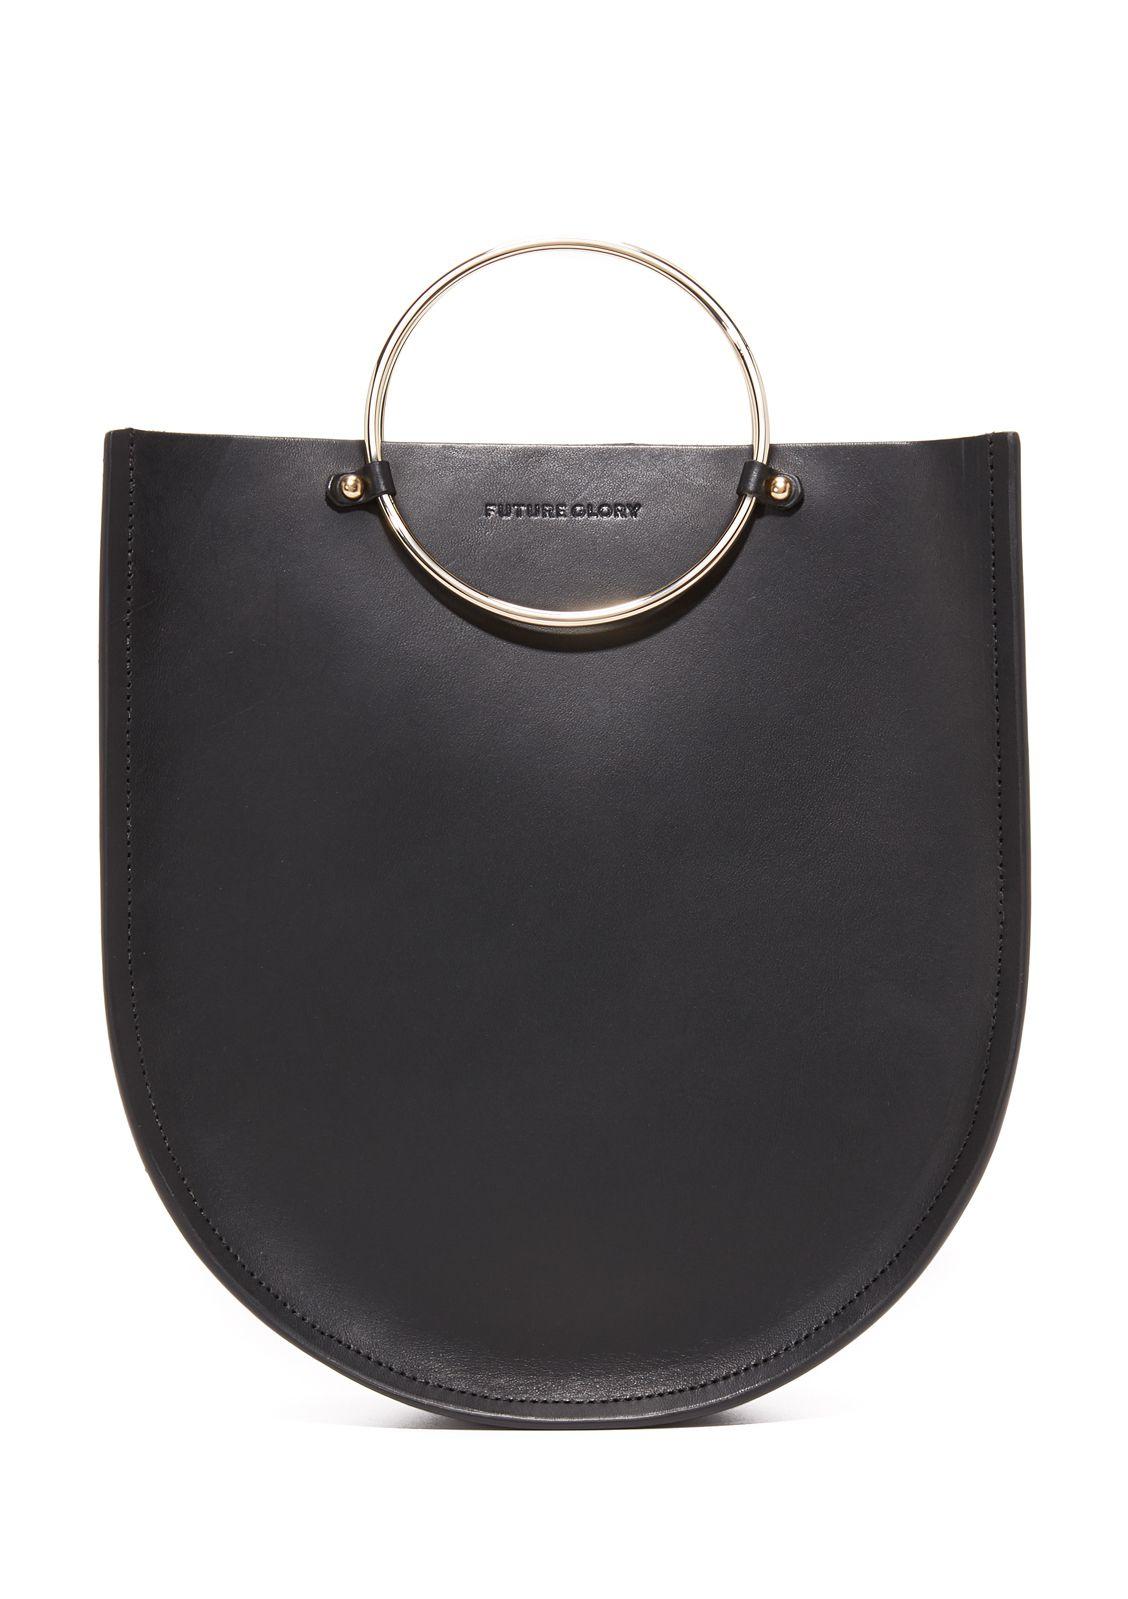 A black Future Glory black bag